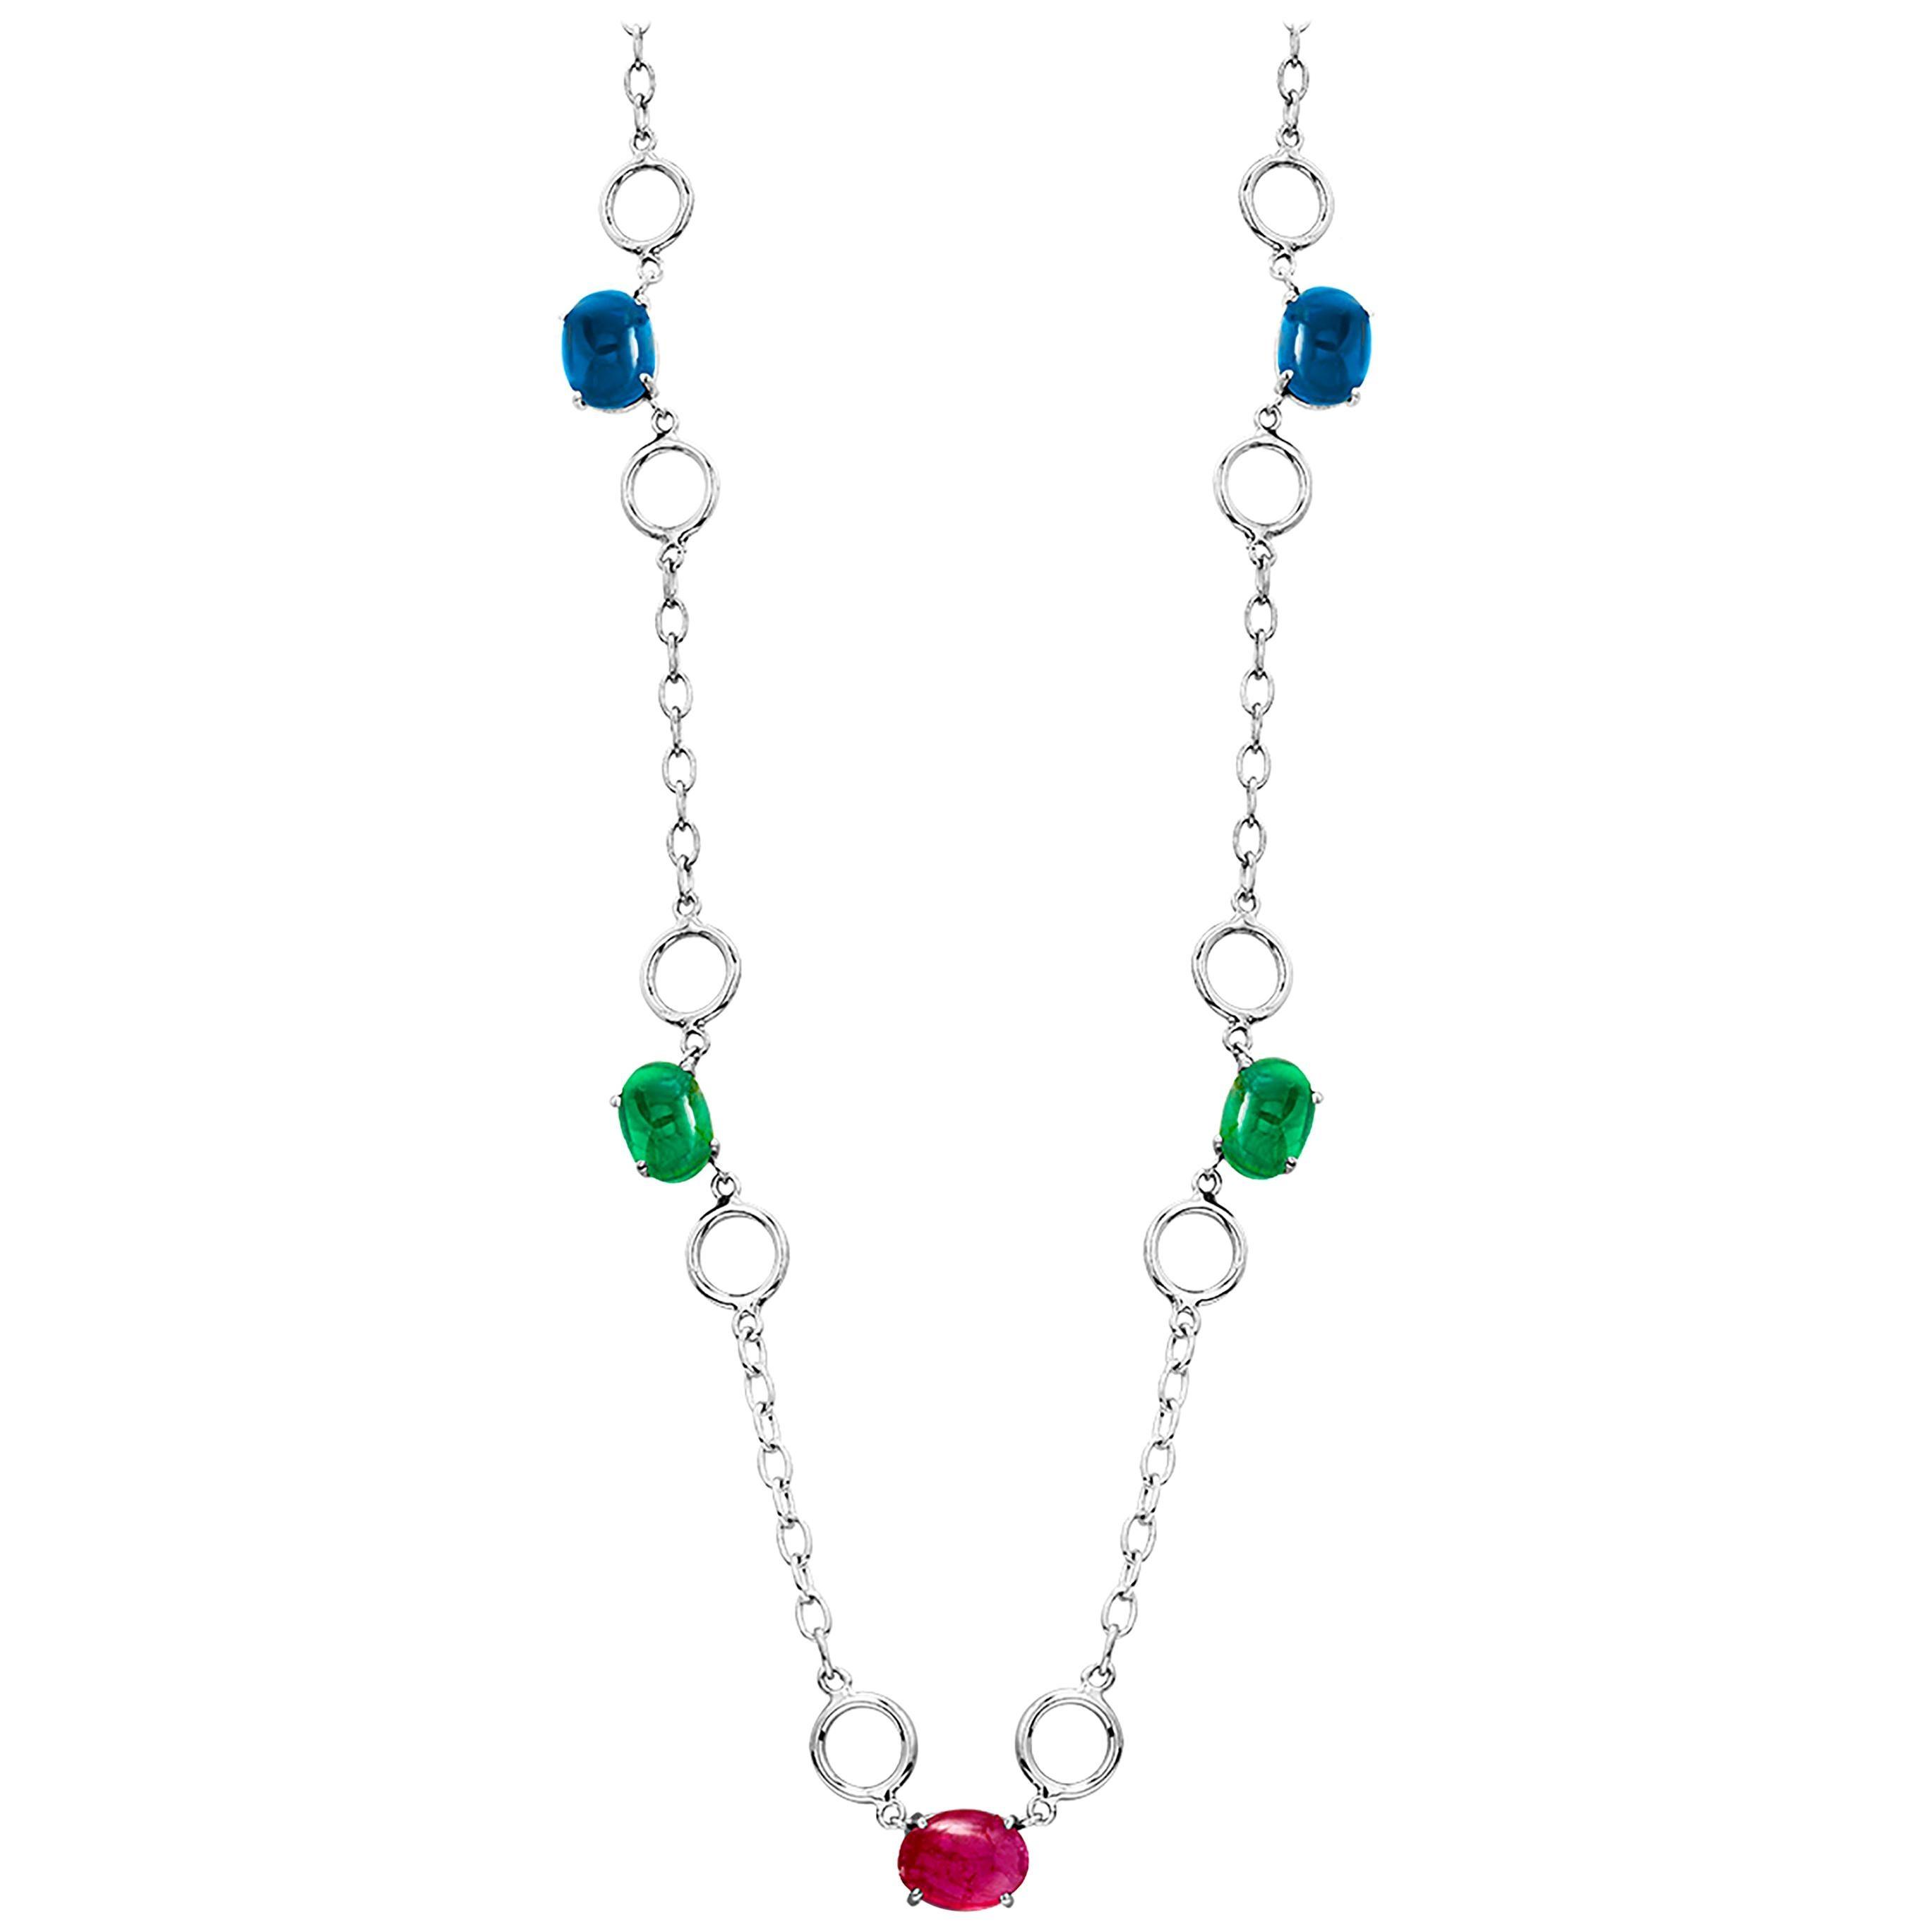 Five Cabochon Sapphire Ruby Emerald Sautoir White Gold Necklace